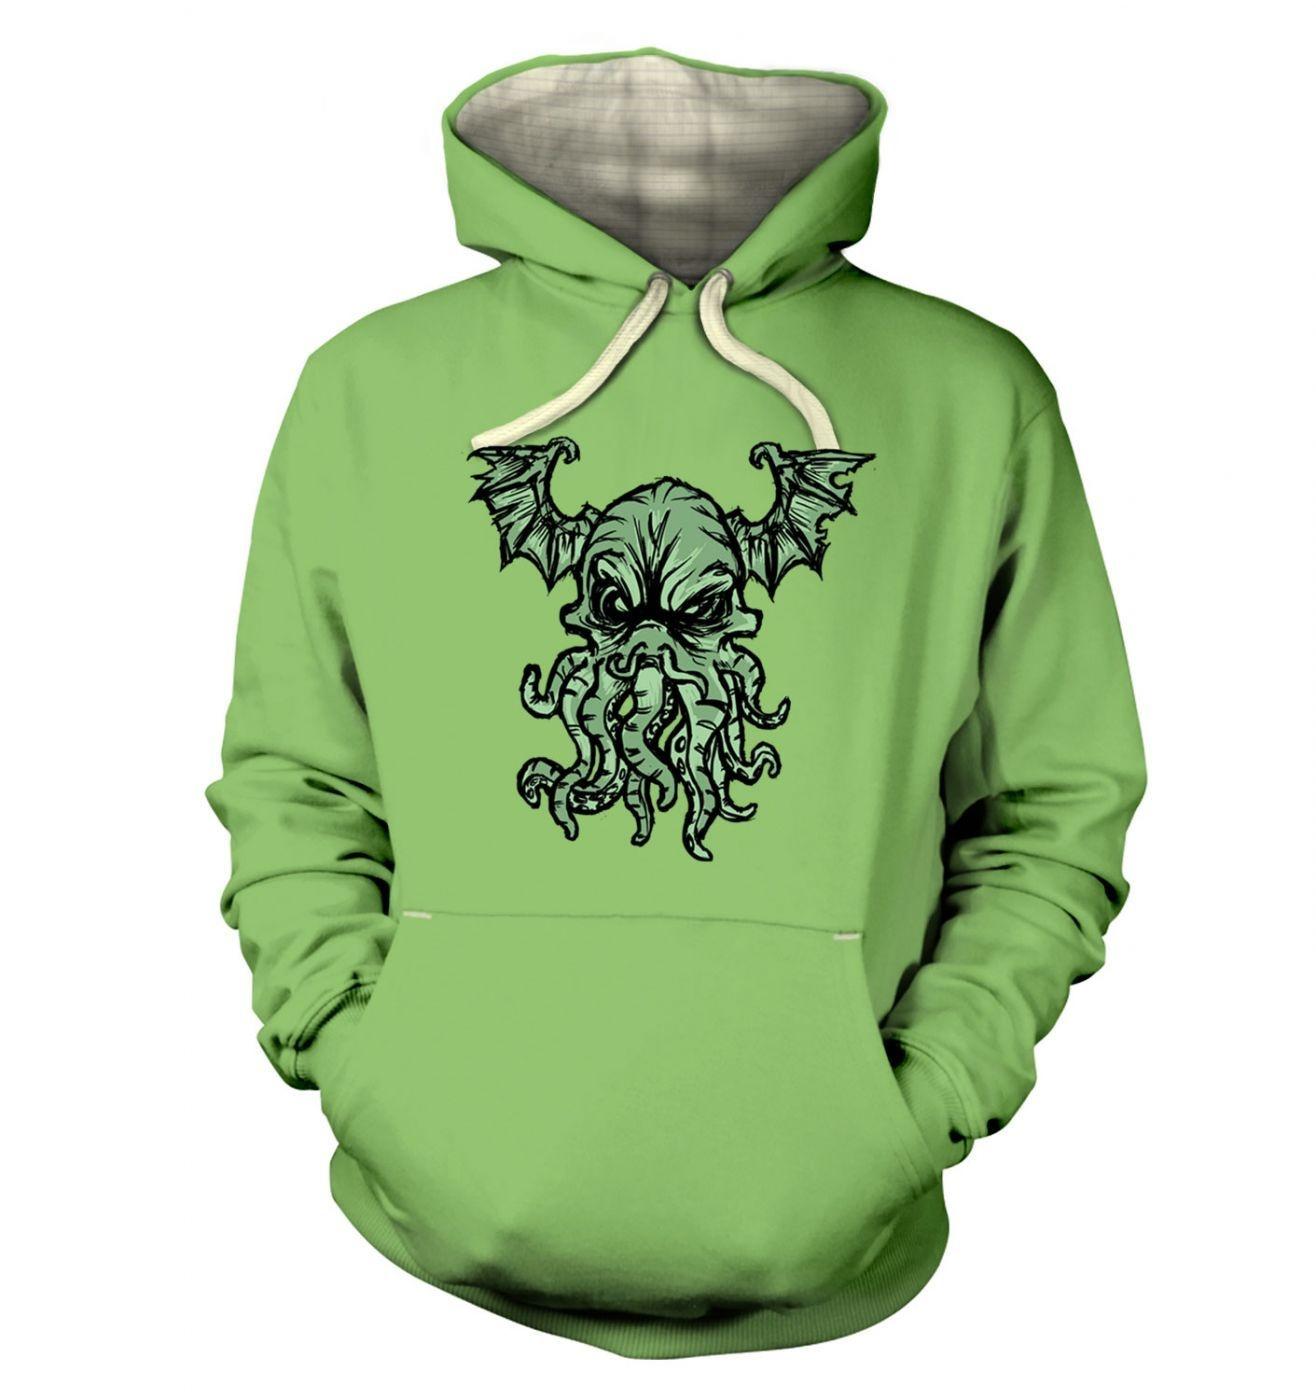 Cthulhu Is Angry hoodie (premium)